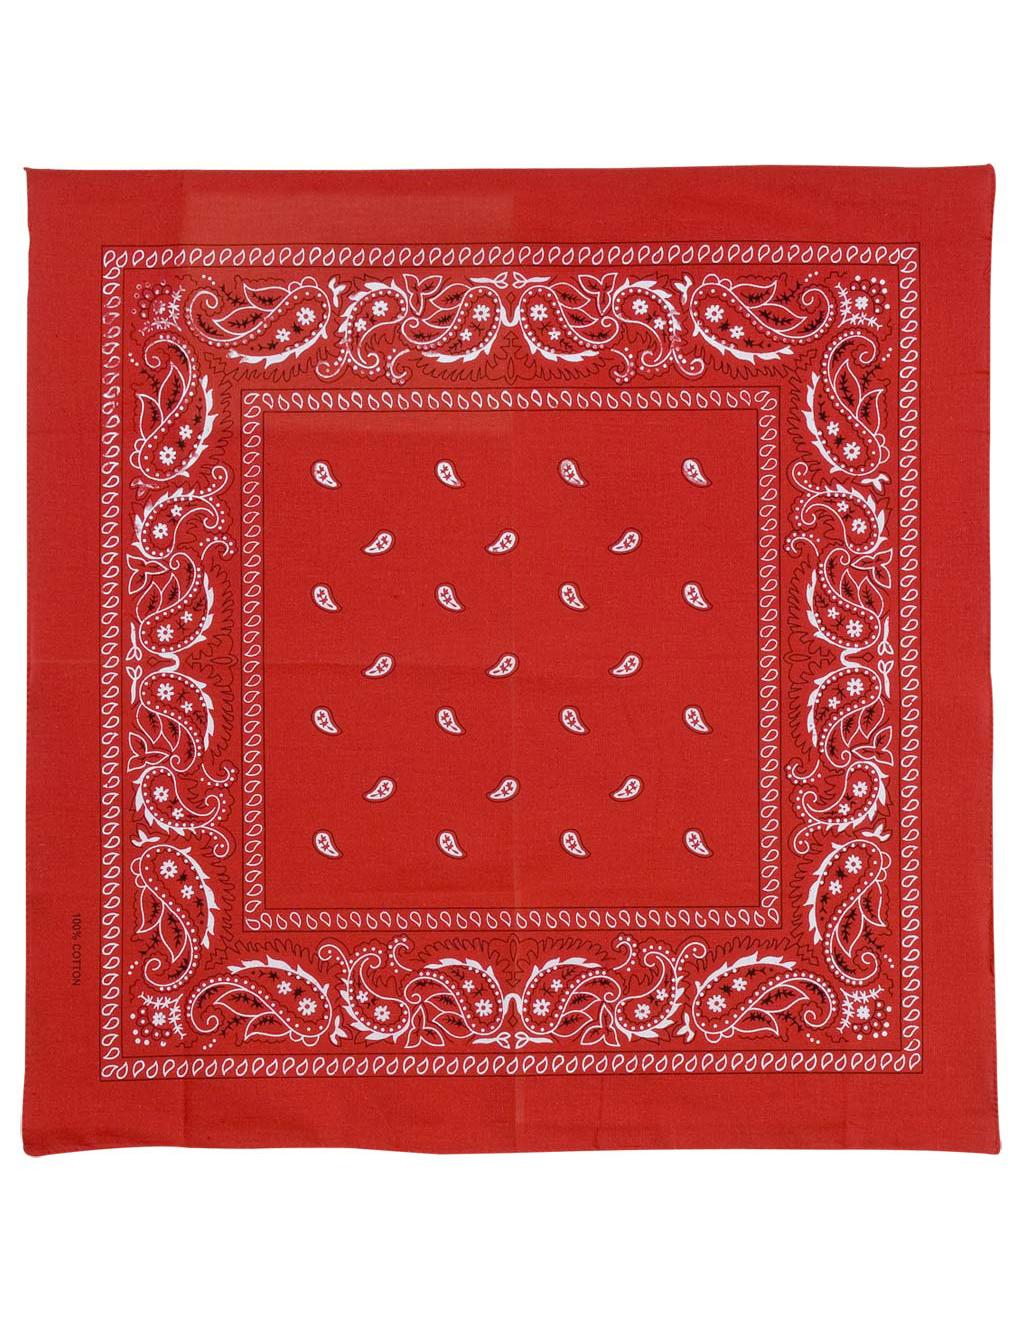 Bandana tuch rot accessoires und g nstige faschingskost me vegaoo - Bandana tuch binden ...